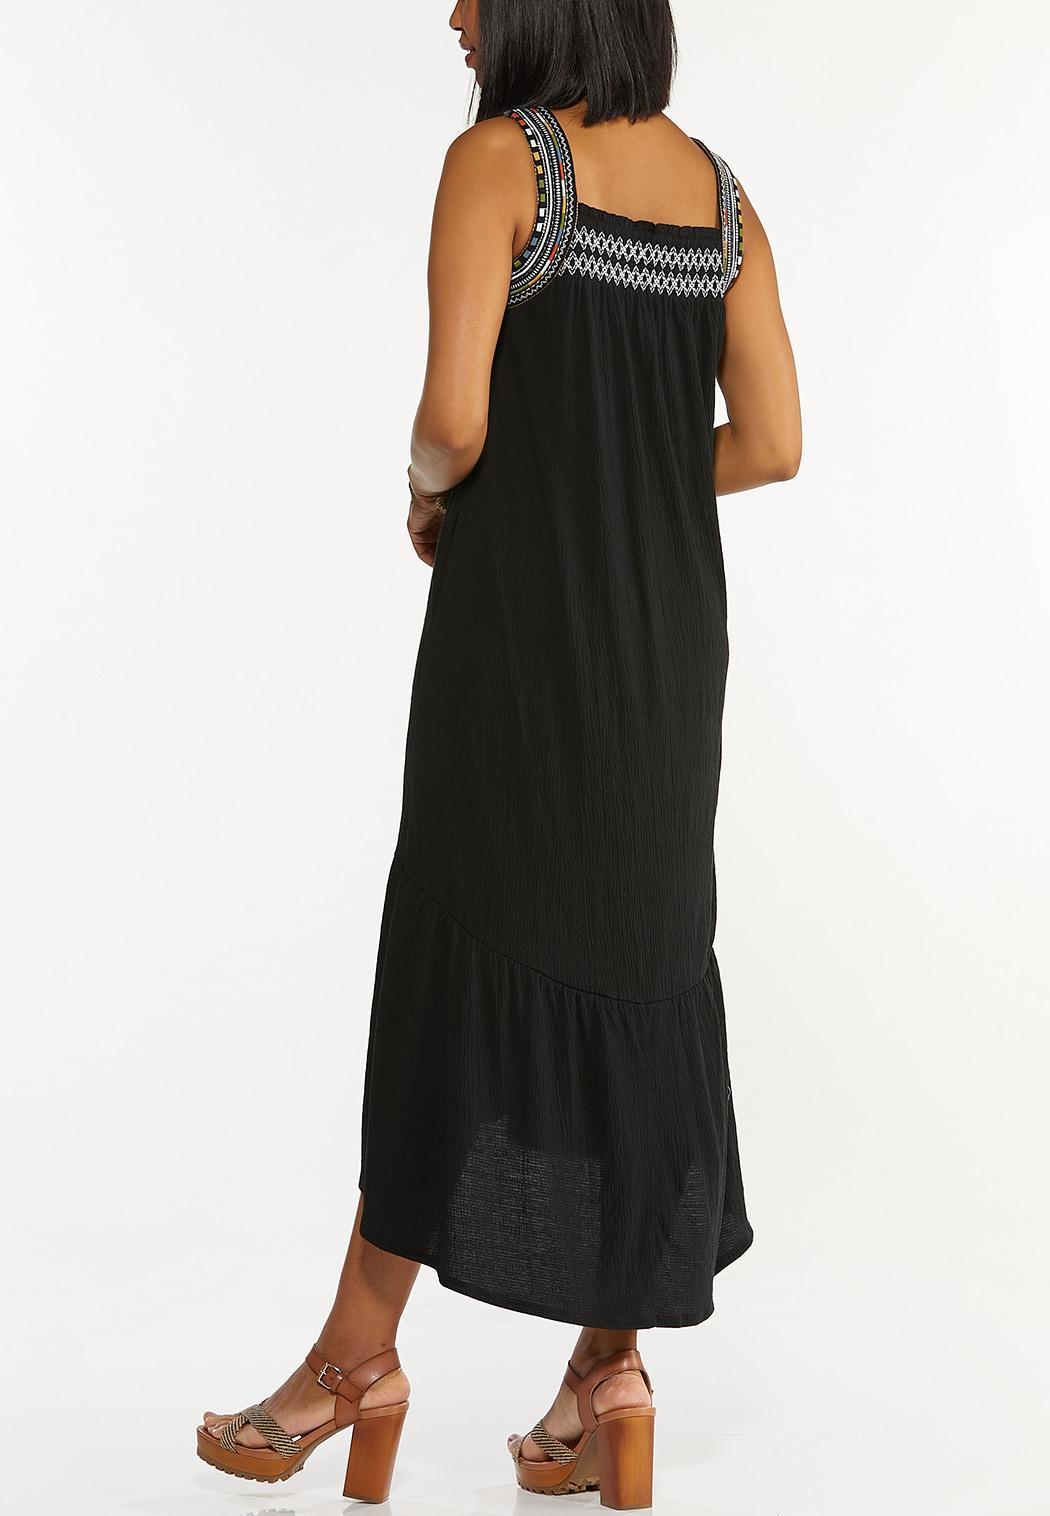 Plus Petite Gauzy Embroidered Dress (Item #44293159)